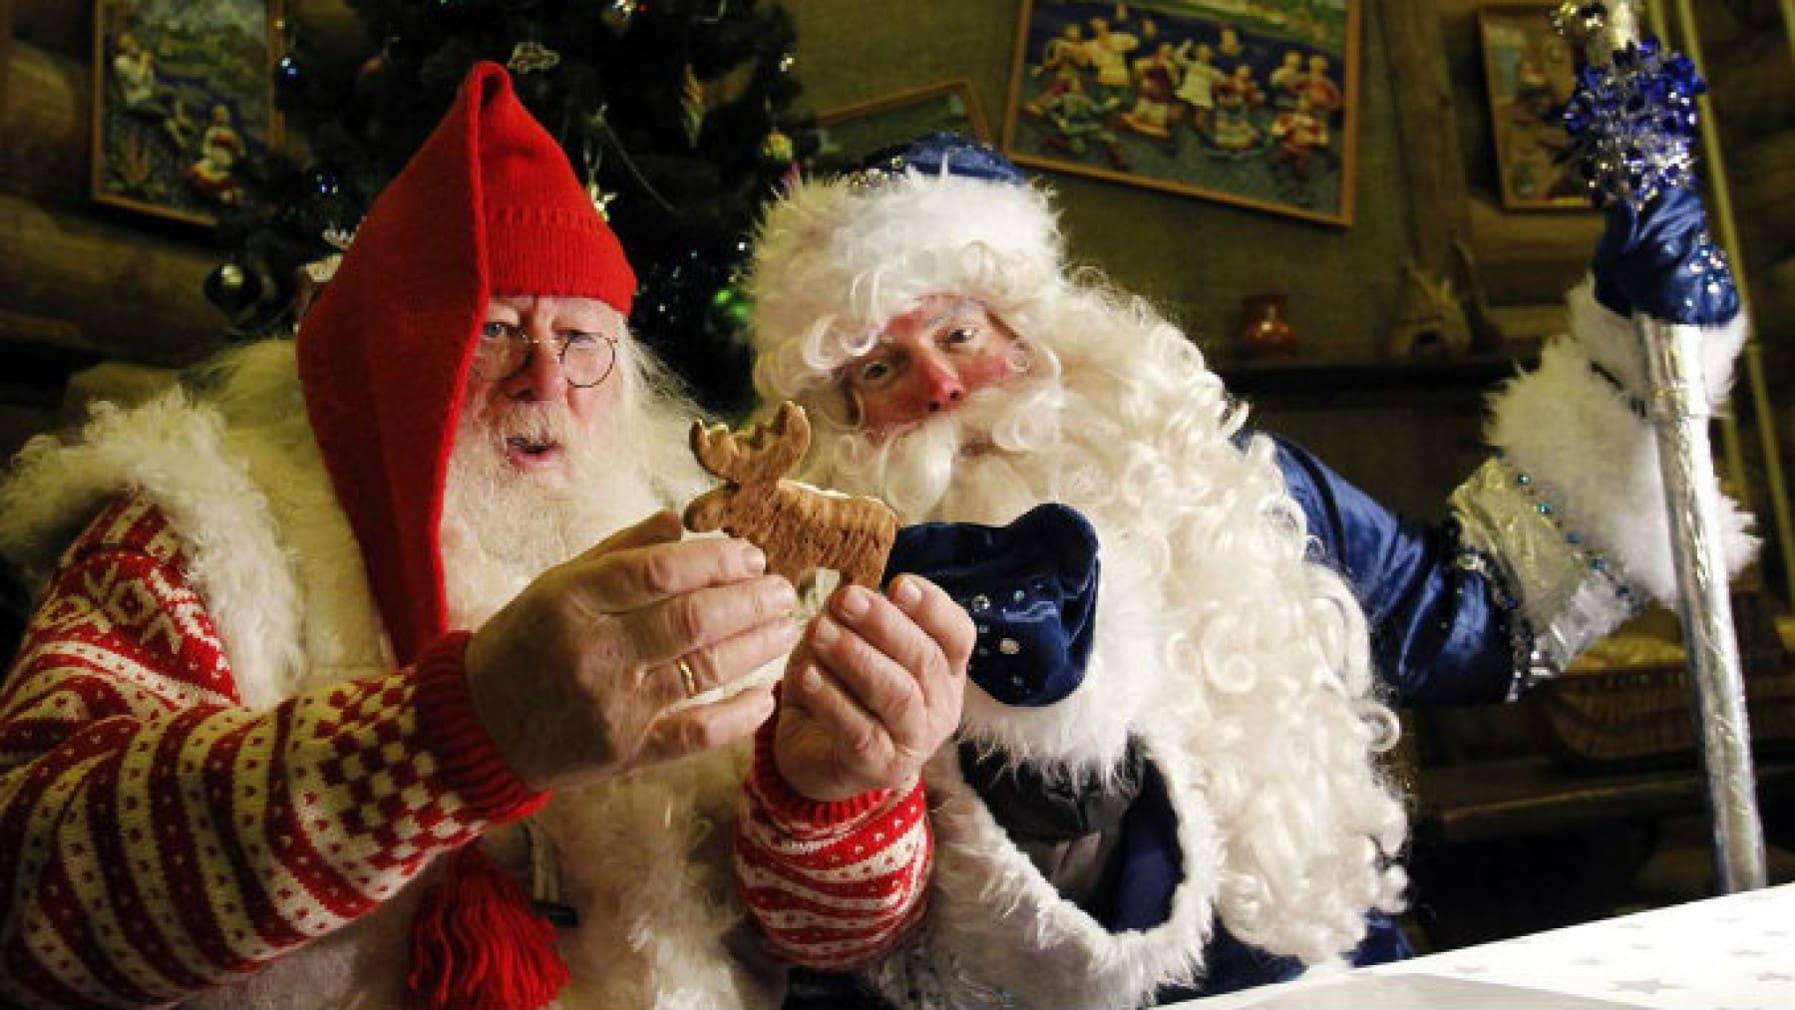 Почему в России Дед Мороз а на Западе Санта Клаус?